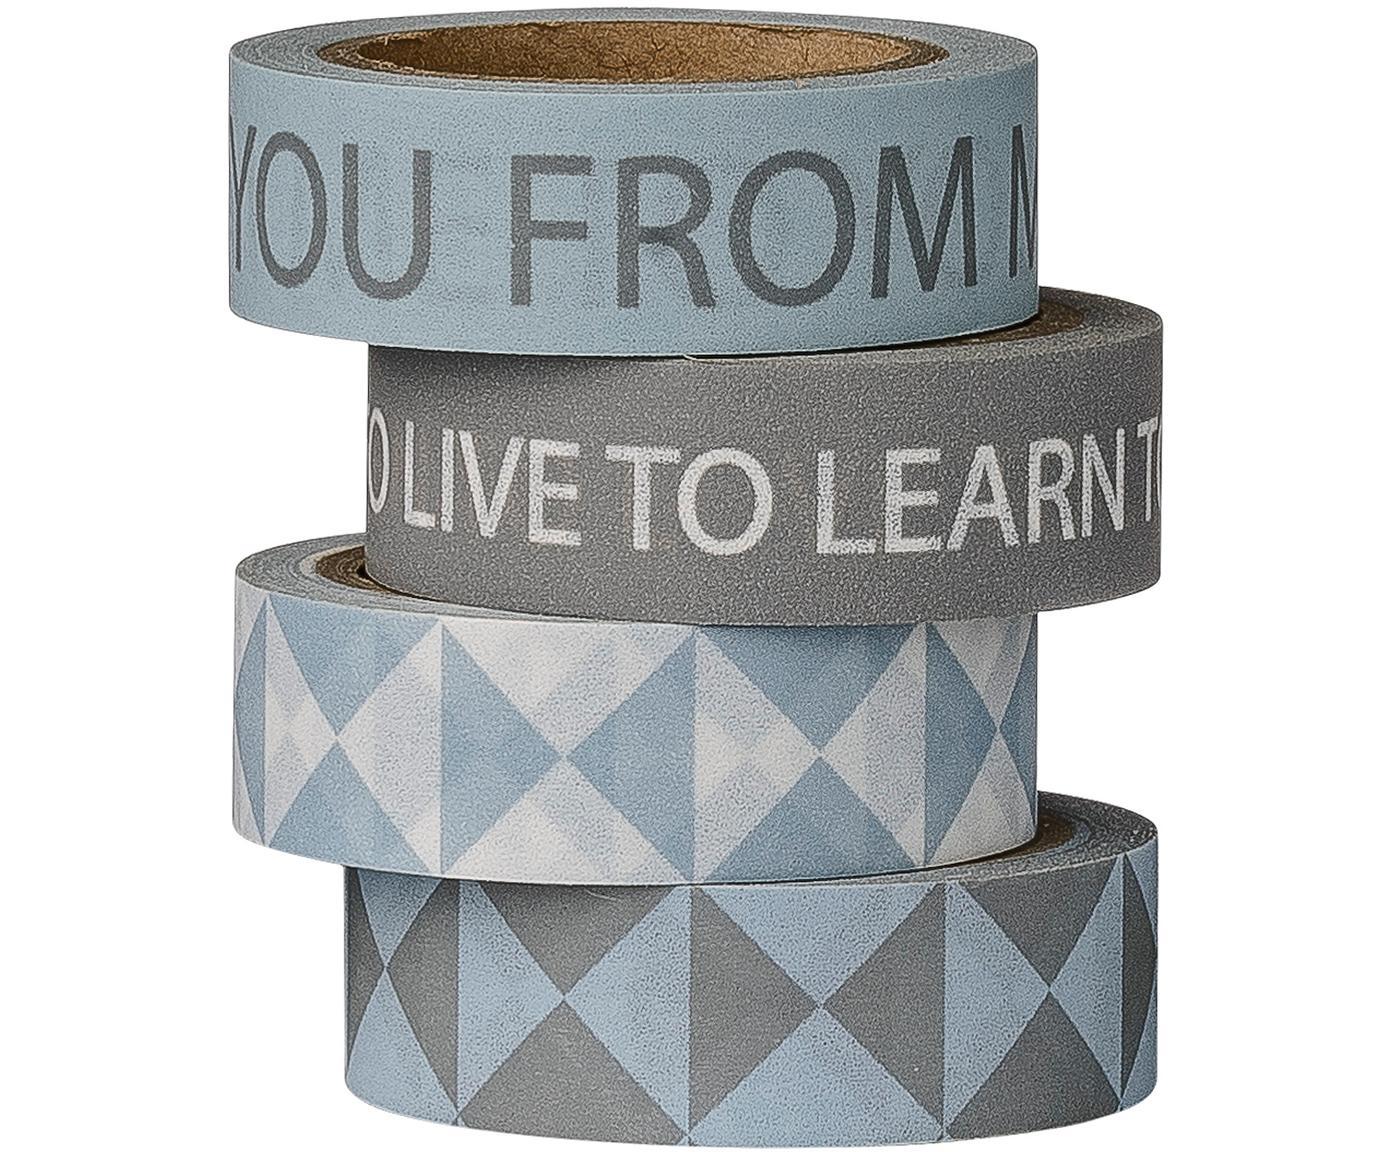 Plakbandset Learn, 4-delig, Papier, Blauw, grijstinten, L 800 cm